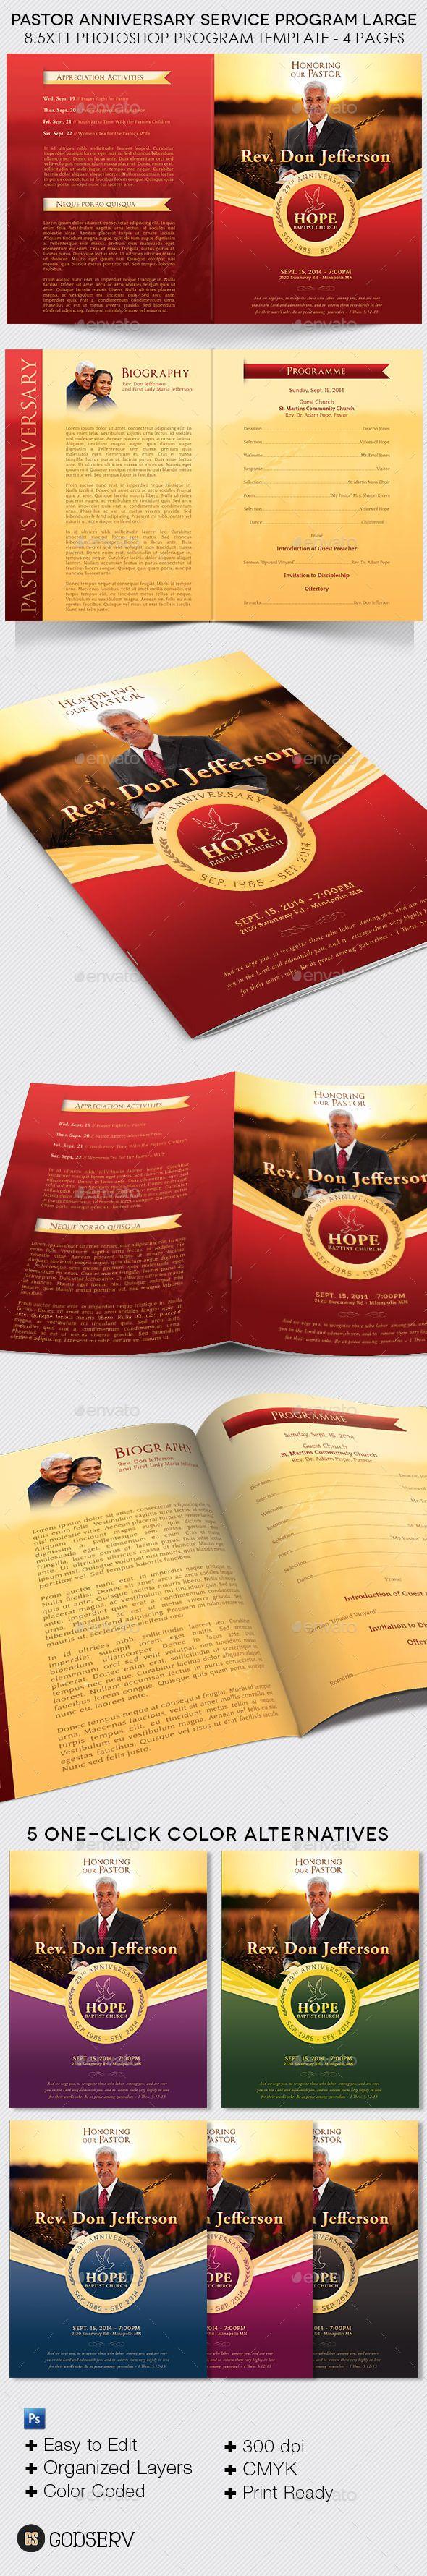 Pastor Anniversary Service Program Large Template